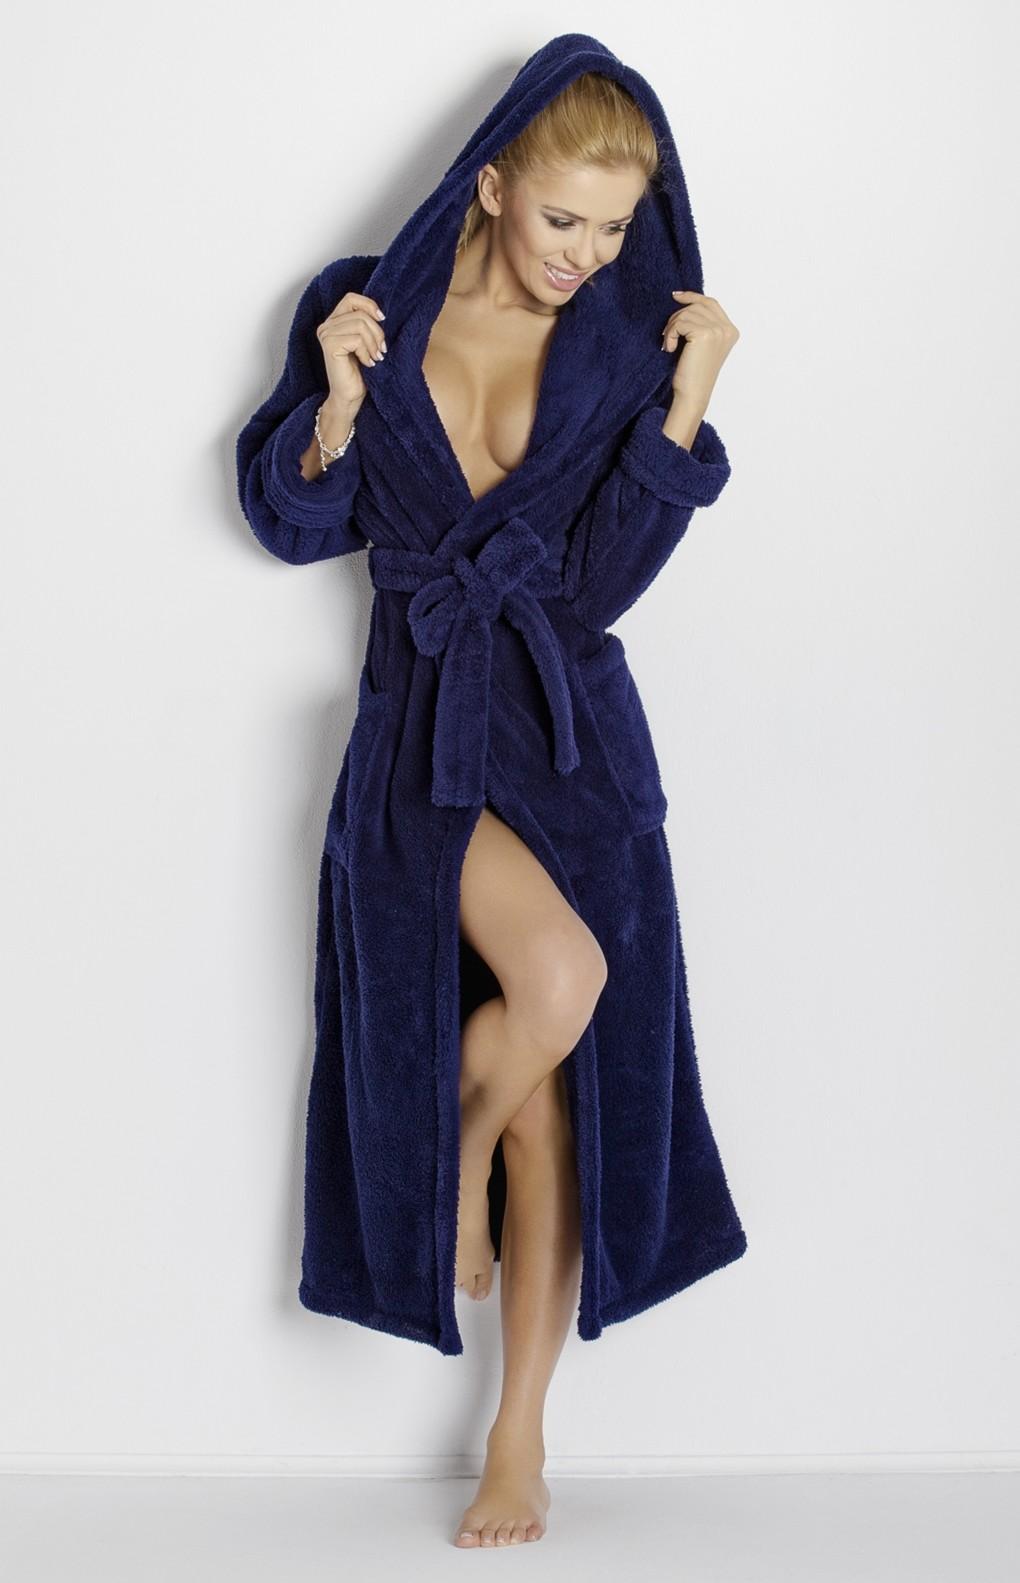 peignoir ponge long capuche bleu marine diana dk dian bm idresstocode boutique de. Black Bedroom Furniture Sets. Home Design Ideas